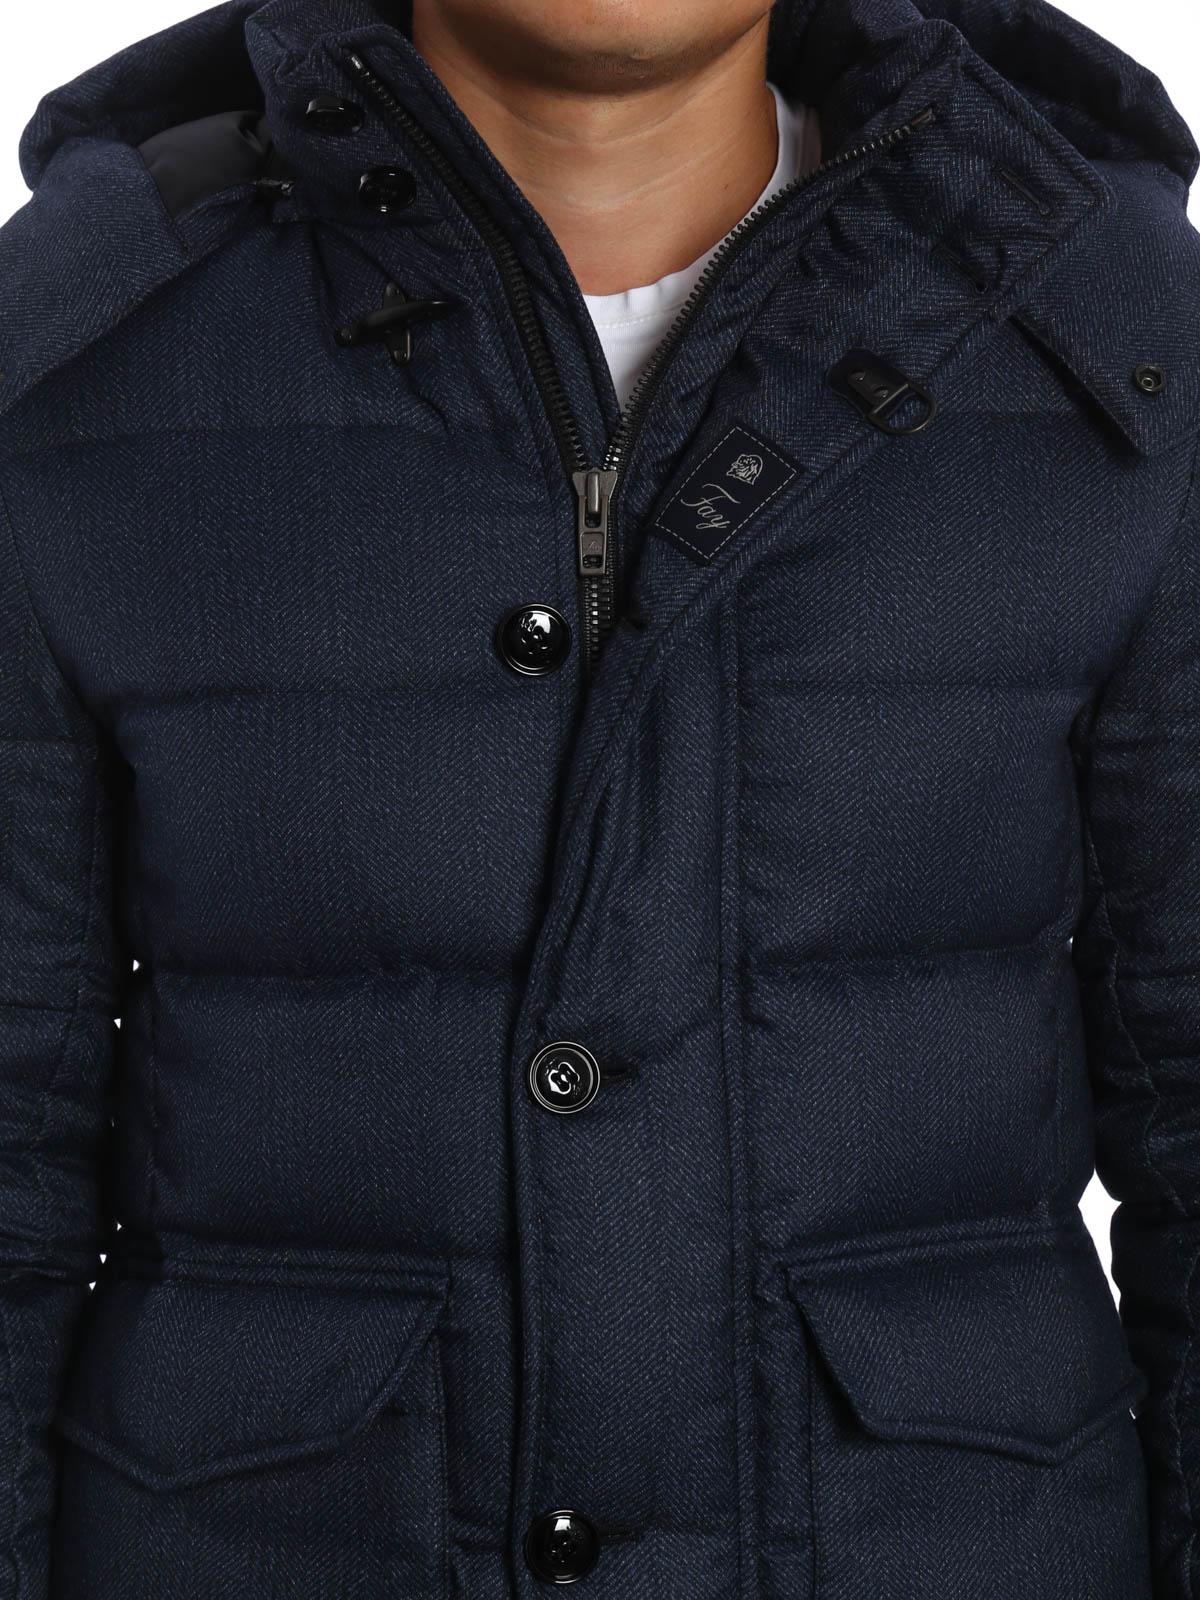 buy popular 8c55c 7a90b Fay - Piumino in tessuto tecnico spigato - giacche imbottite ...